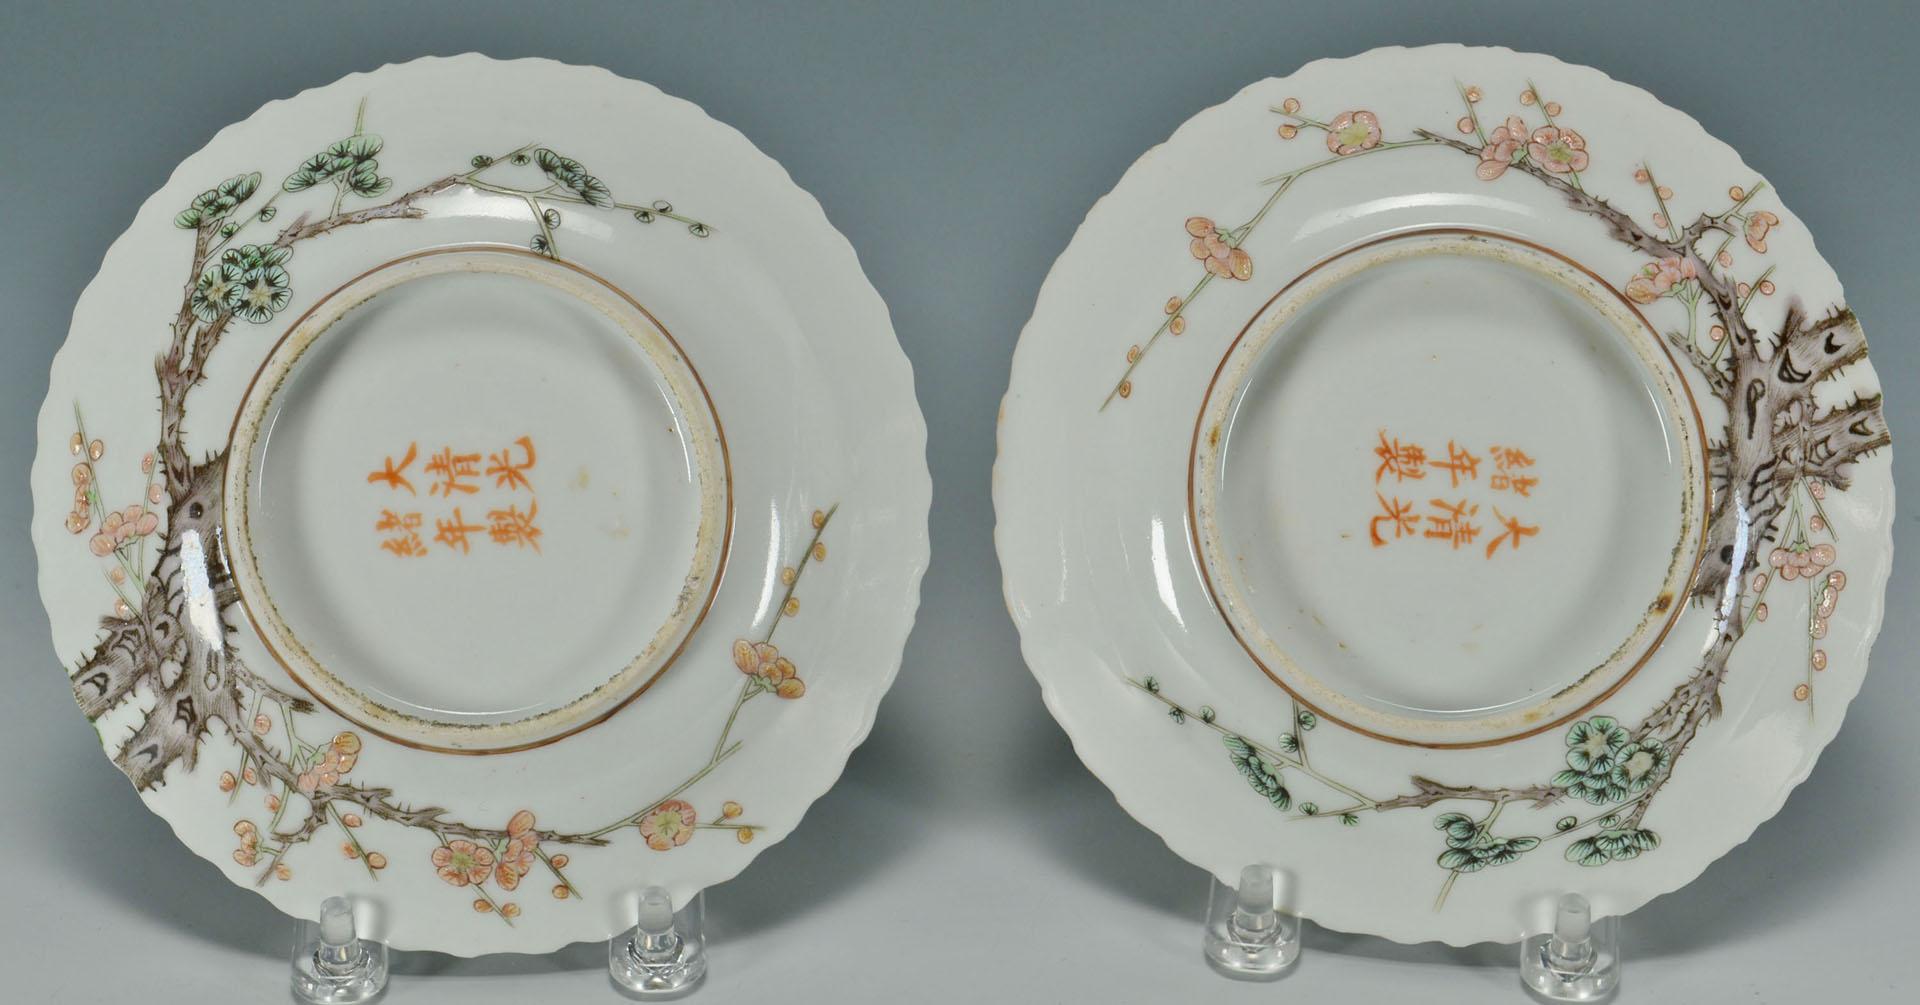 Asian Buttons and Ceramics